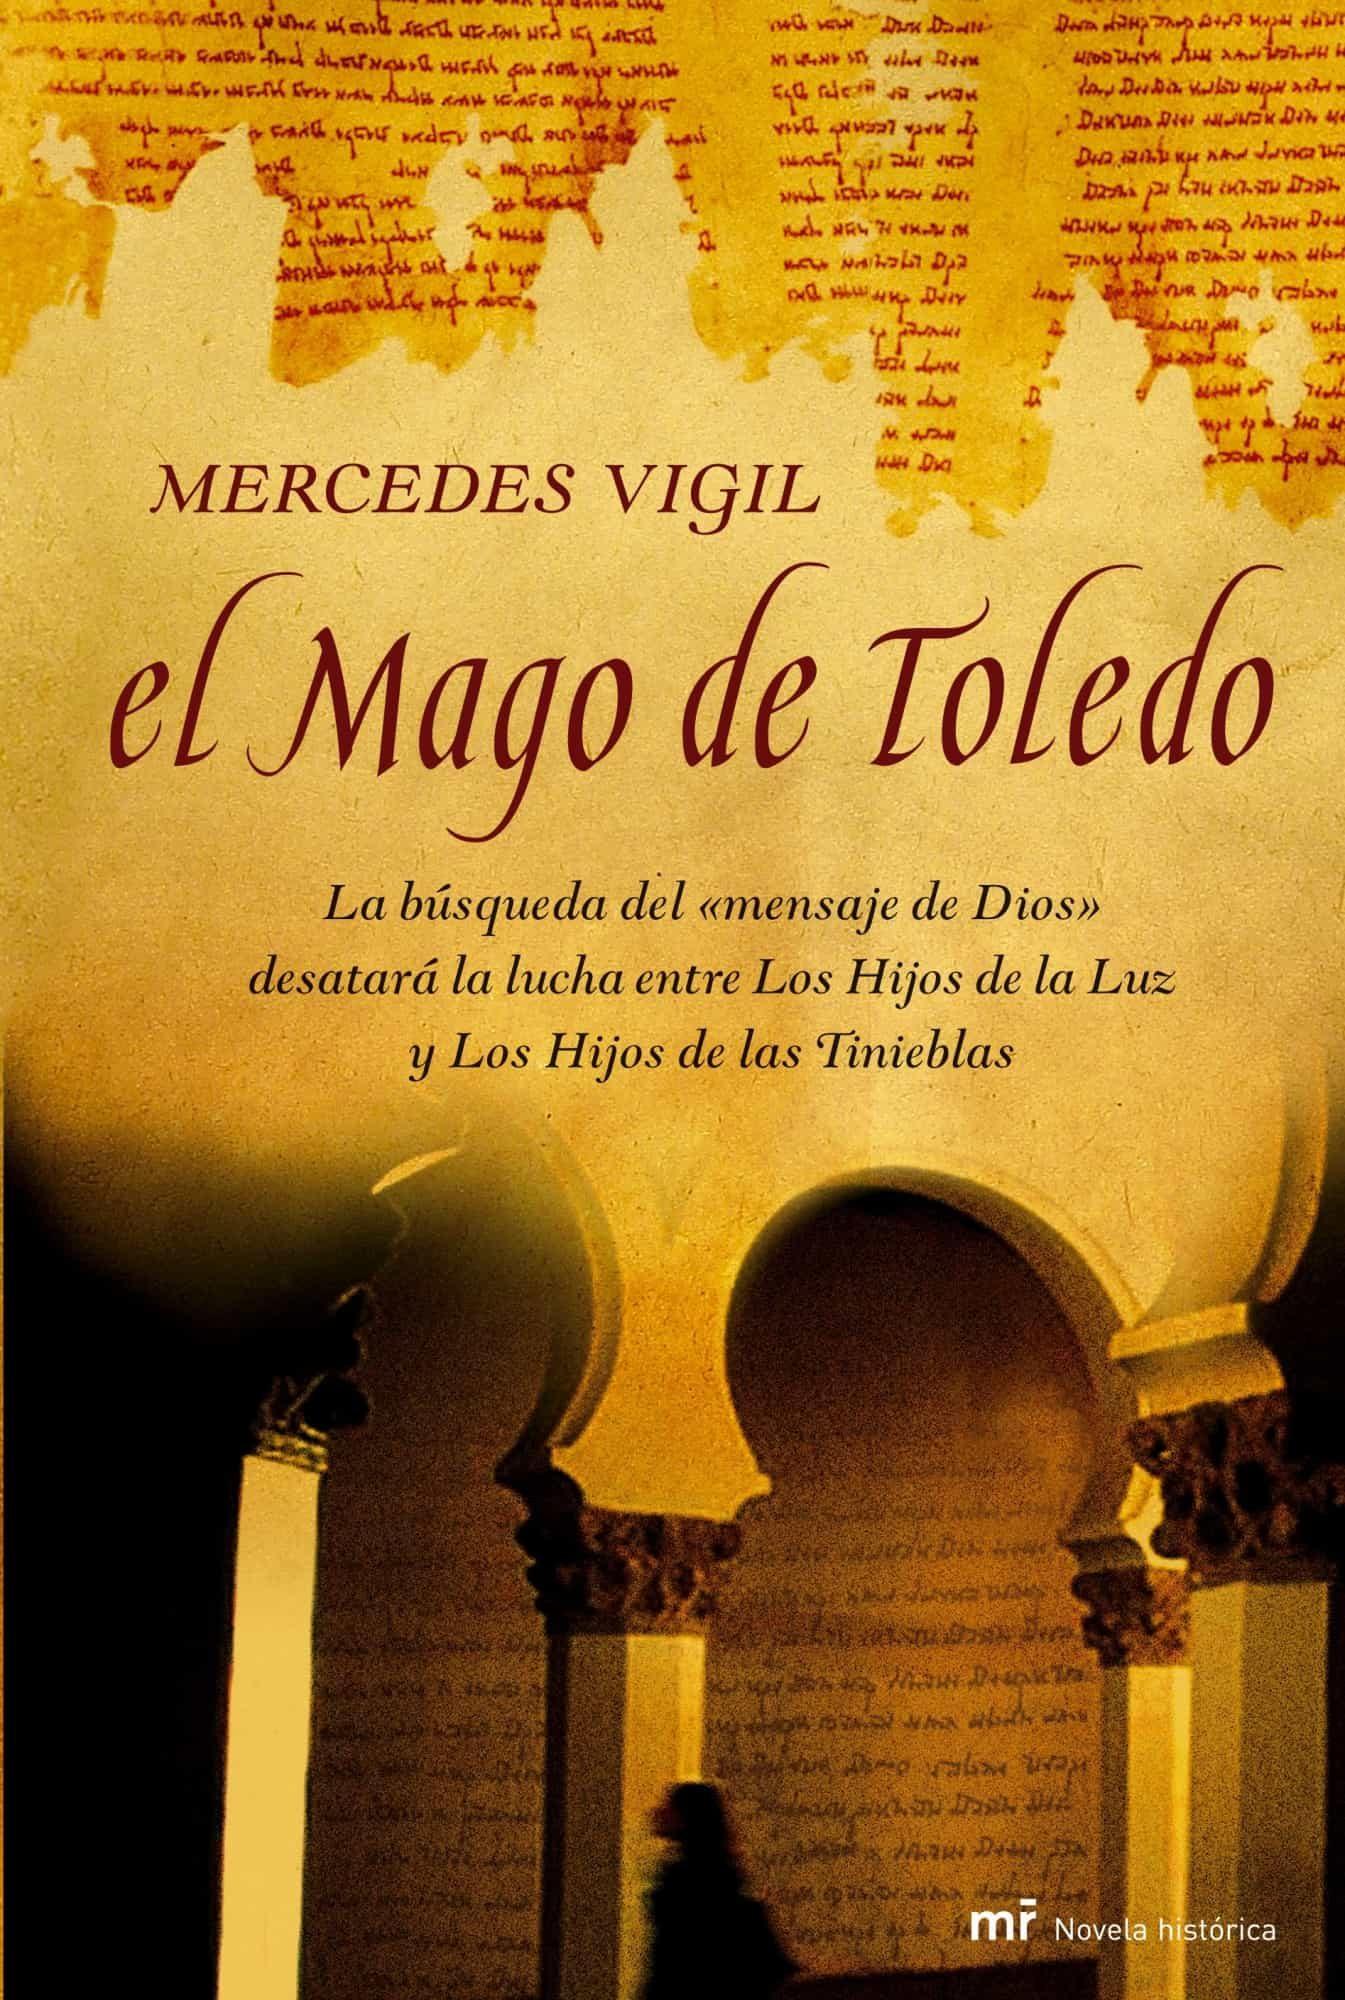 El Mago De Toledo por Mercedes Vigil